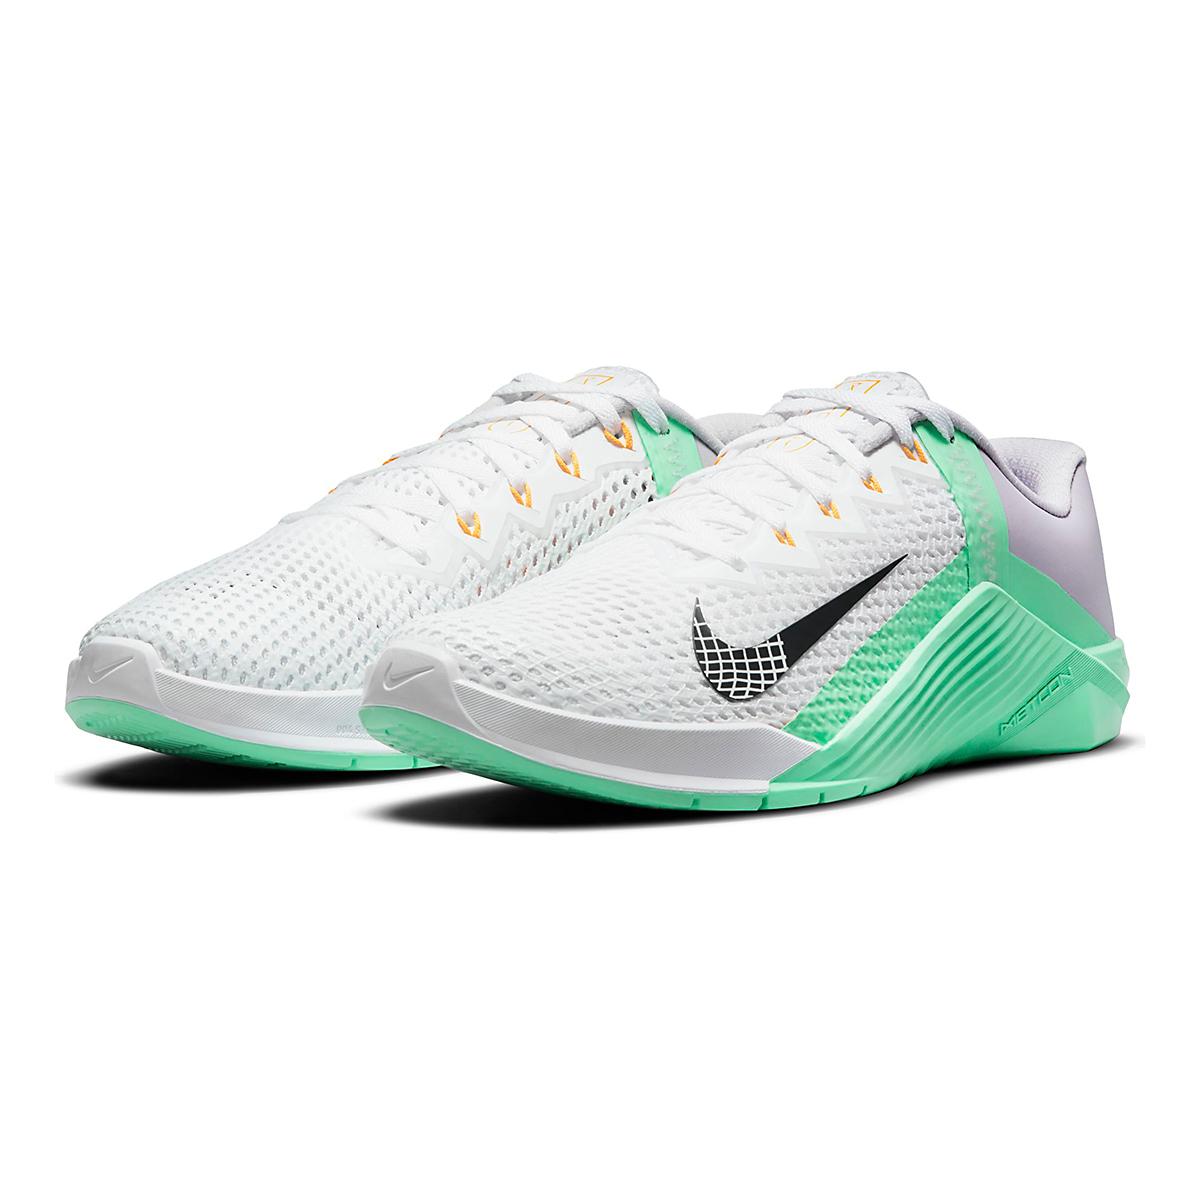 Women's Nike Metcon 6 Training Shoe - Color: White/Smoke Grey/Infinite Lilac - Size: 5 - Width: Regular, White/Smoke Grey/Infinite Lilac, large, image 4